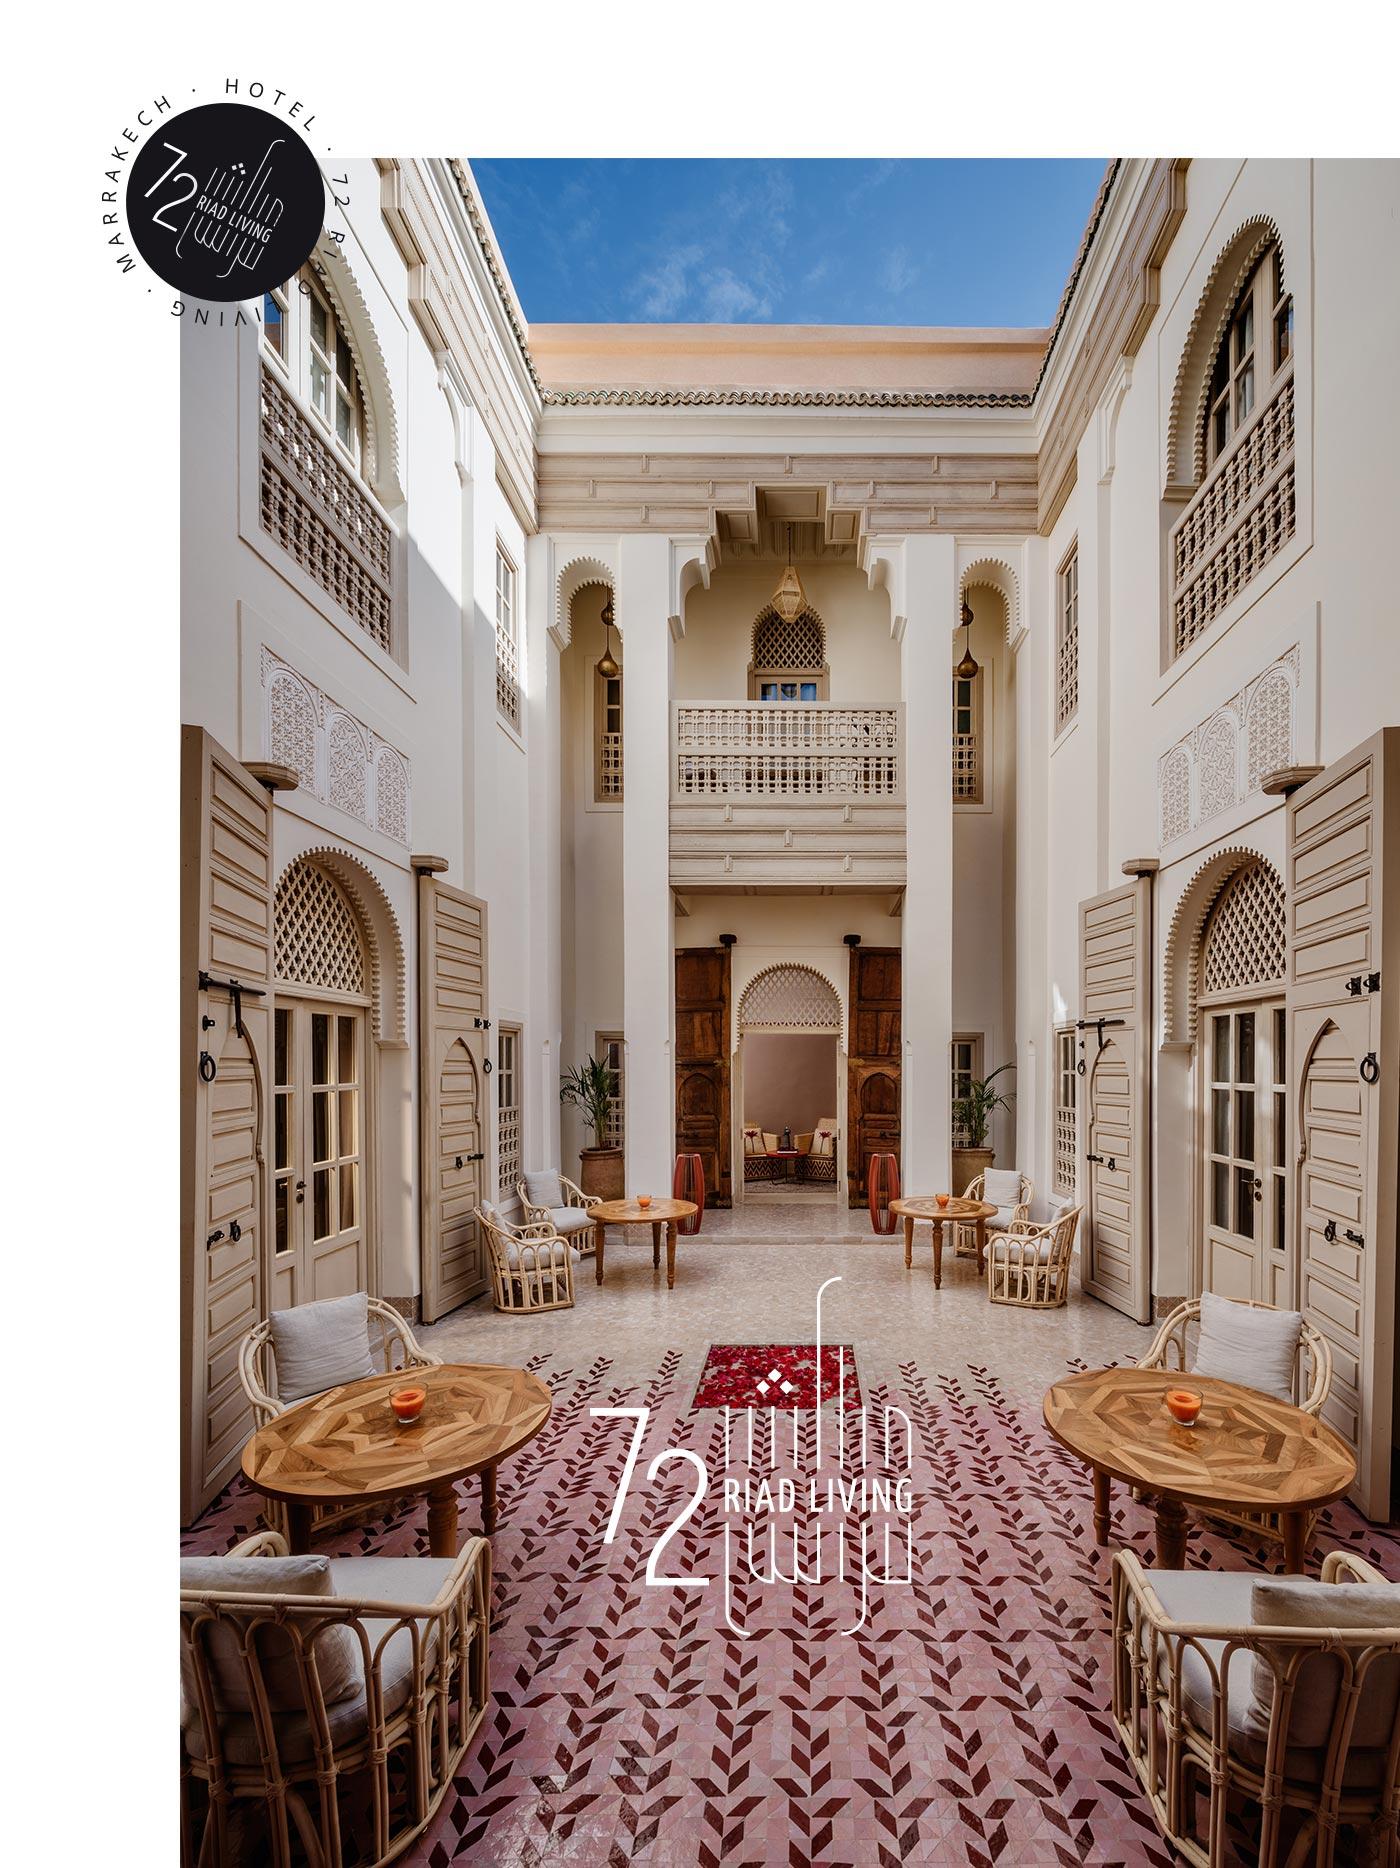 LOGOTIPO RIAD LIVING 72 Marrakech grafico milano 06